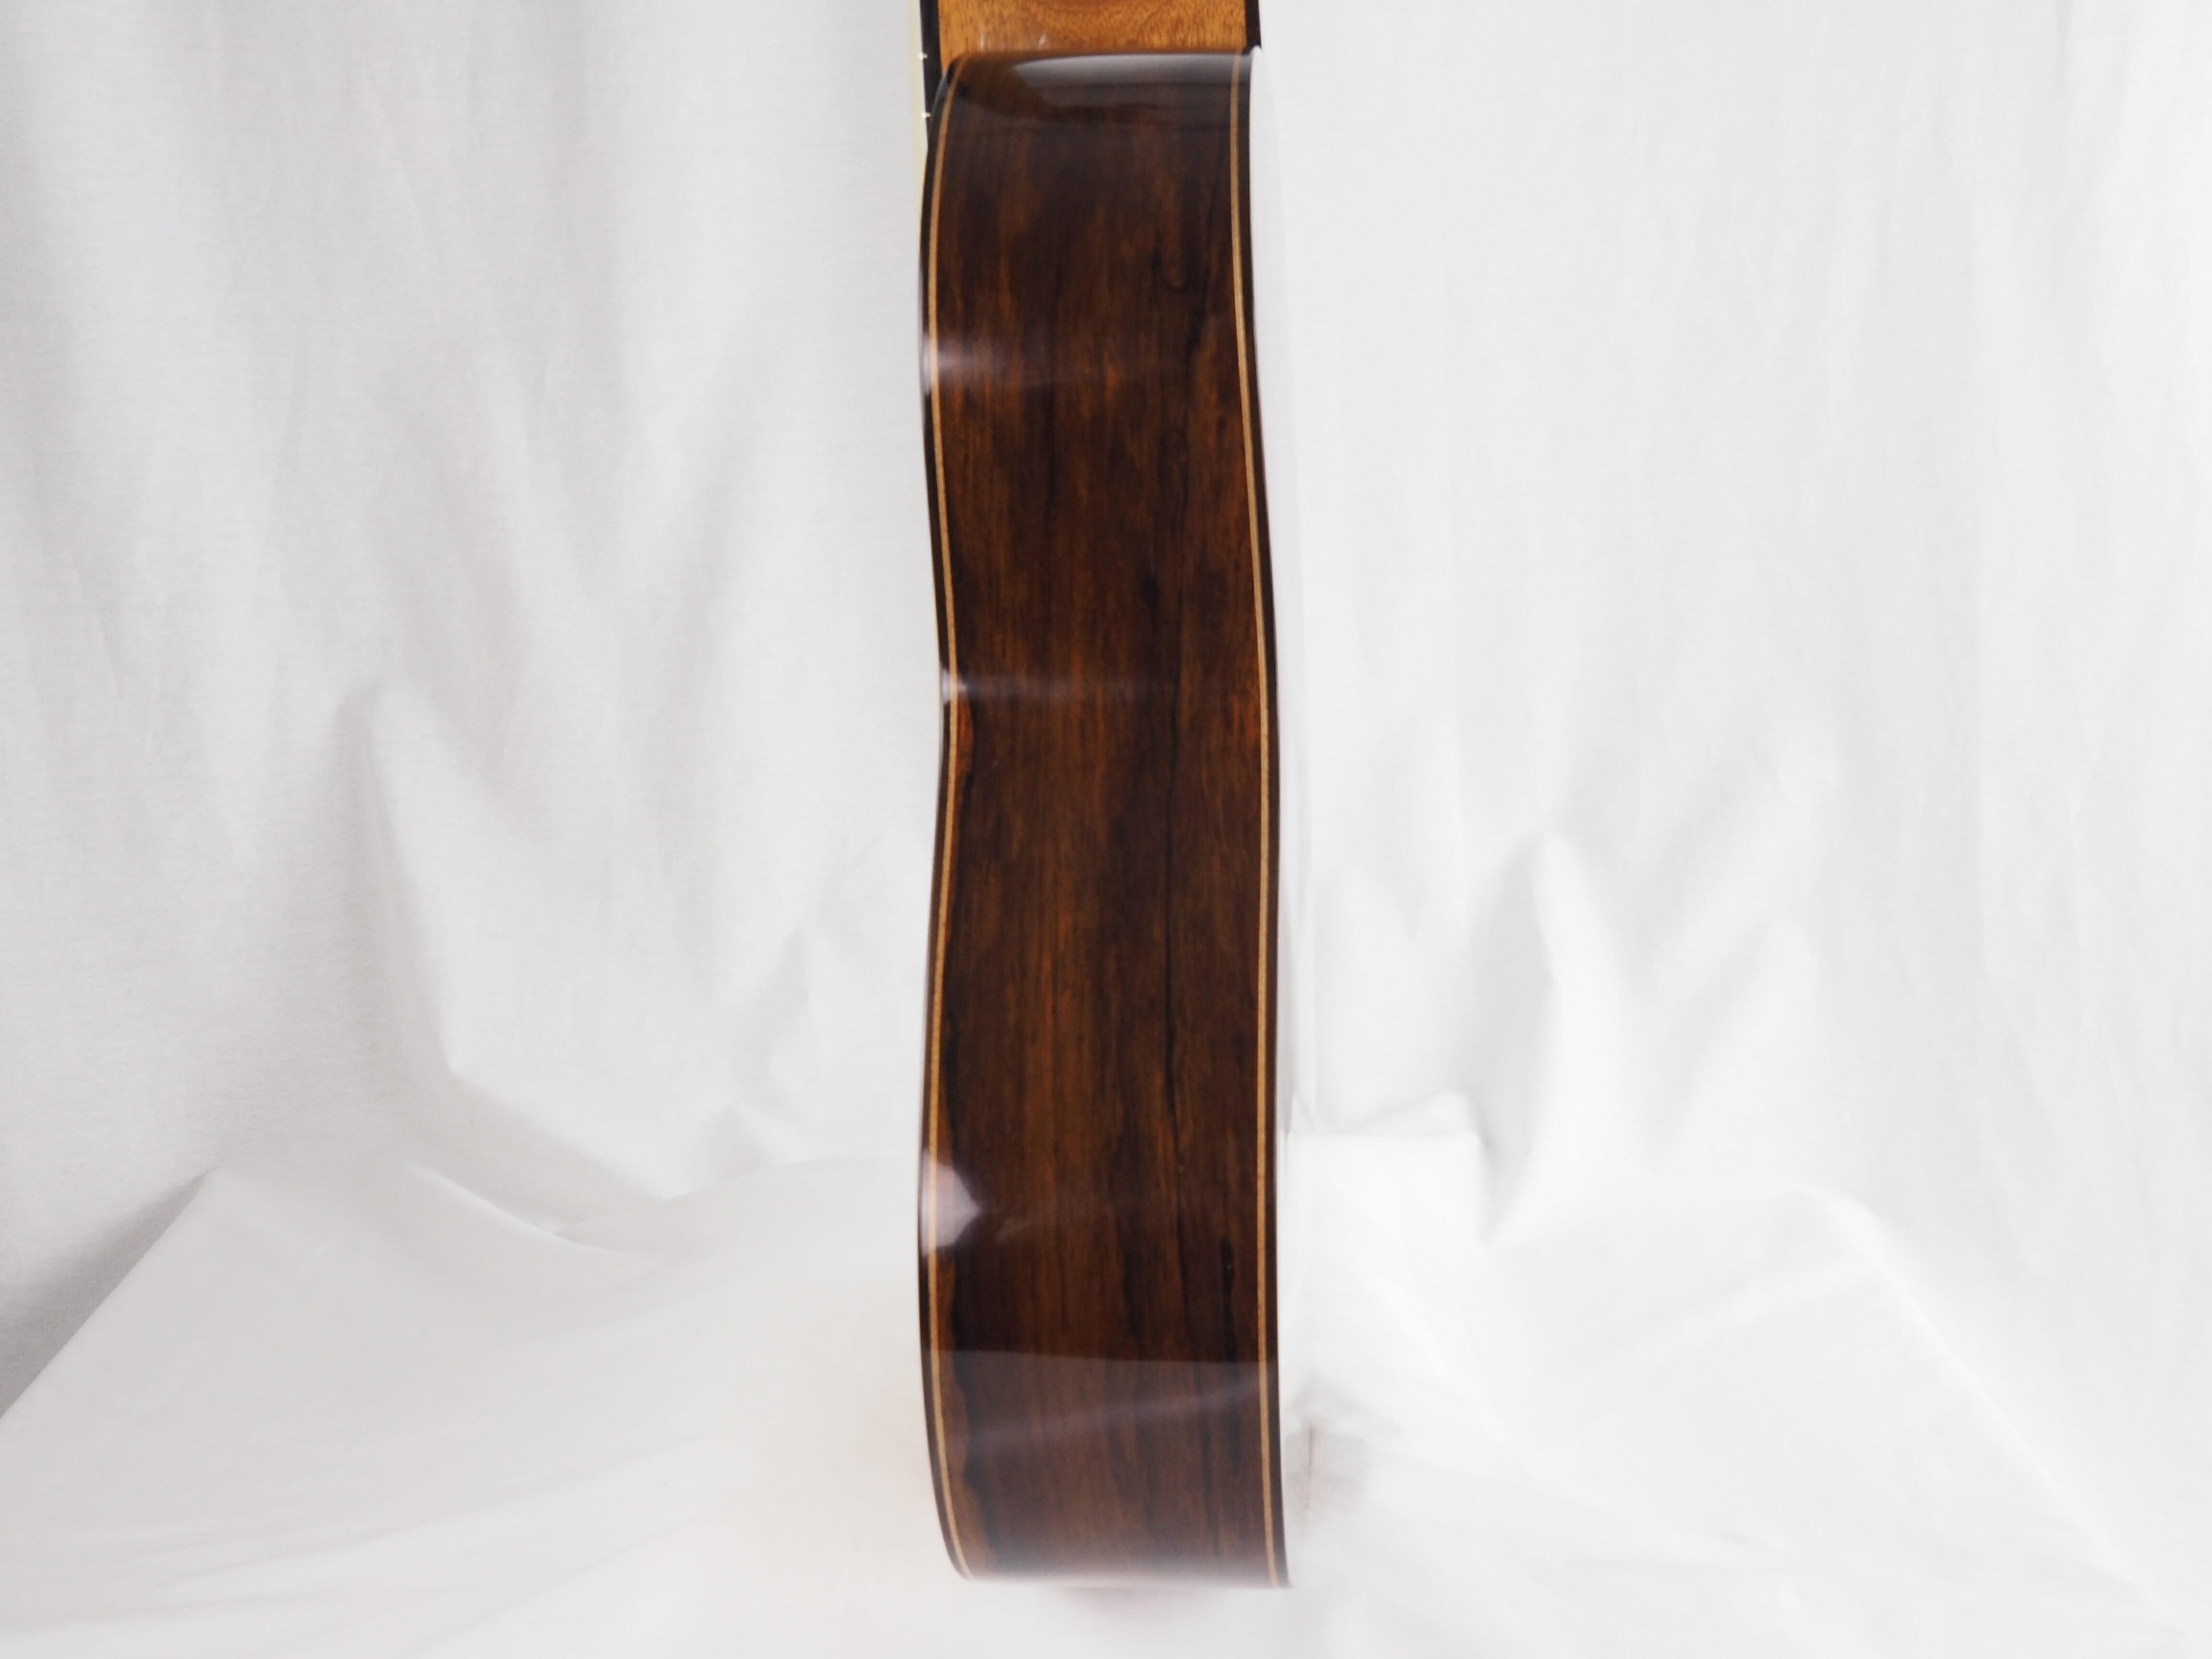 Luthier Keijo Korelin guitare classique double-table 17KOR093-07